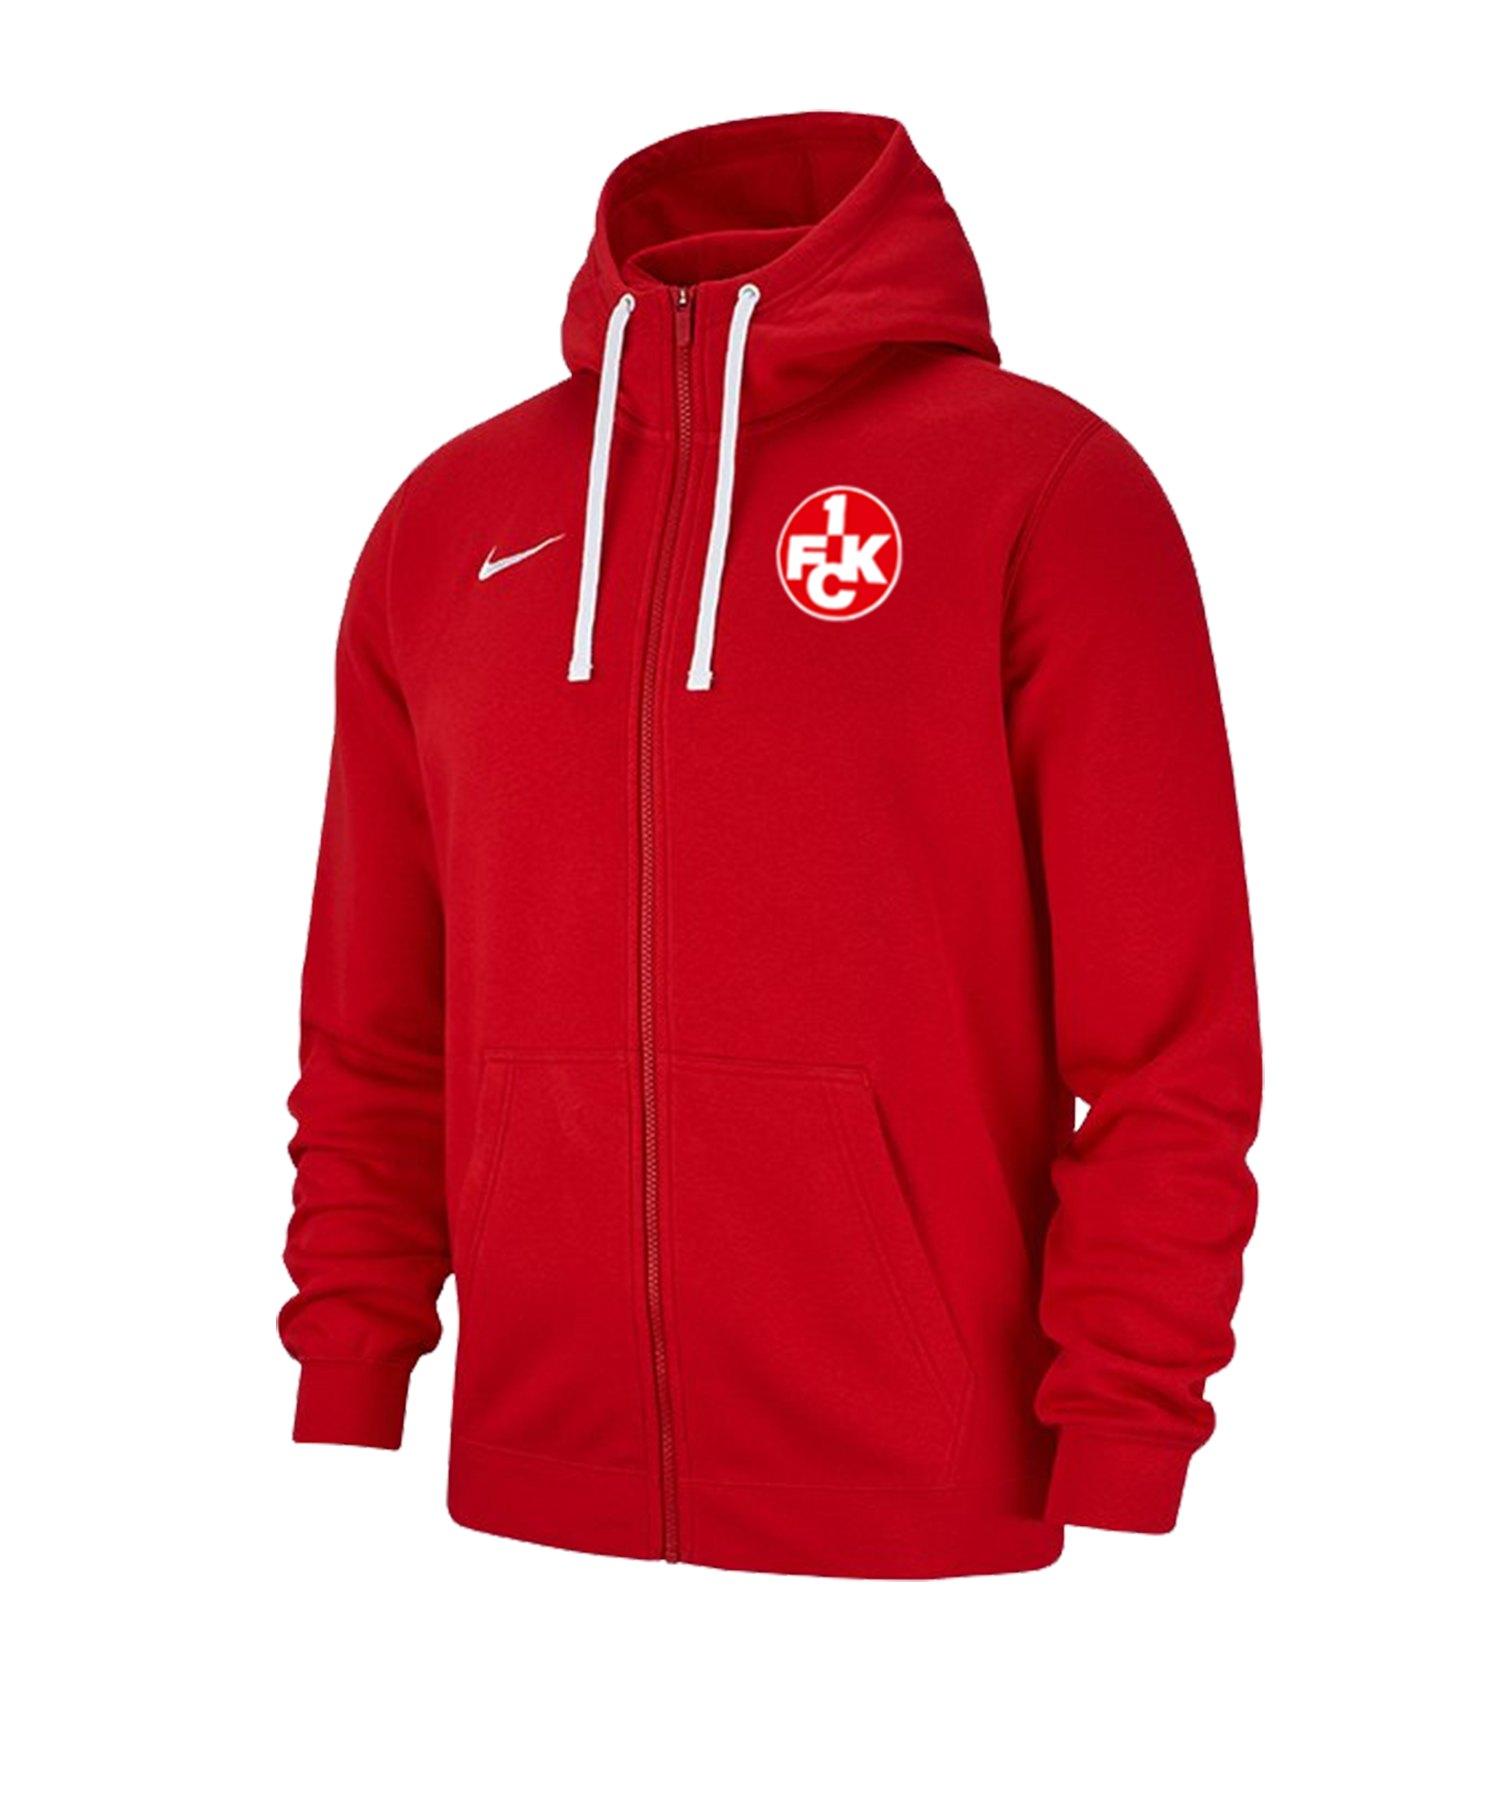 Nike 1. FC Kaiserslautern Kapuzenjacke Rot F657 - rot